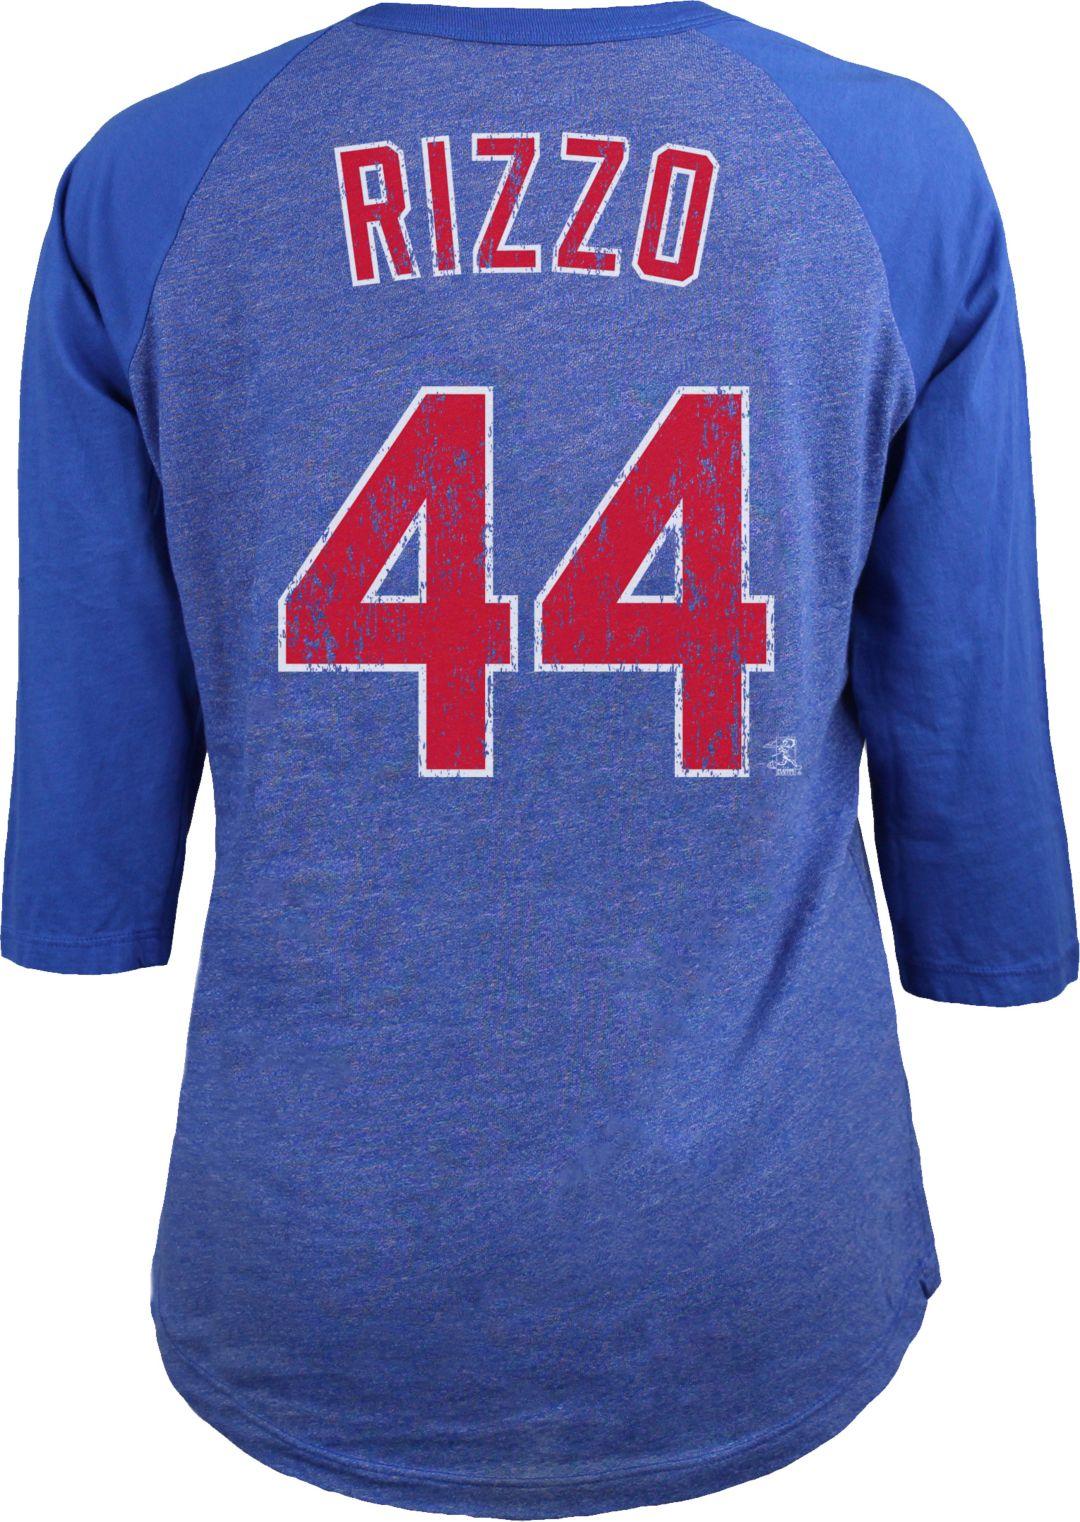 best website f75c8 ba28d Majestic Threads Women's Chicago Cubs Anthony Rizzo #44 Raglan Royal  Three-Quarter Sleeve Shirt